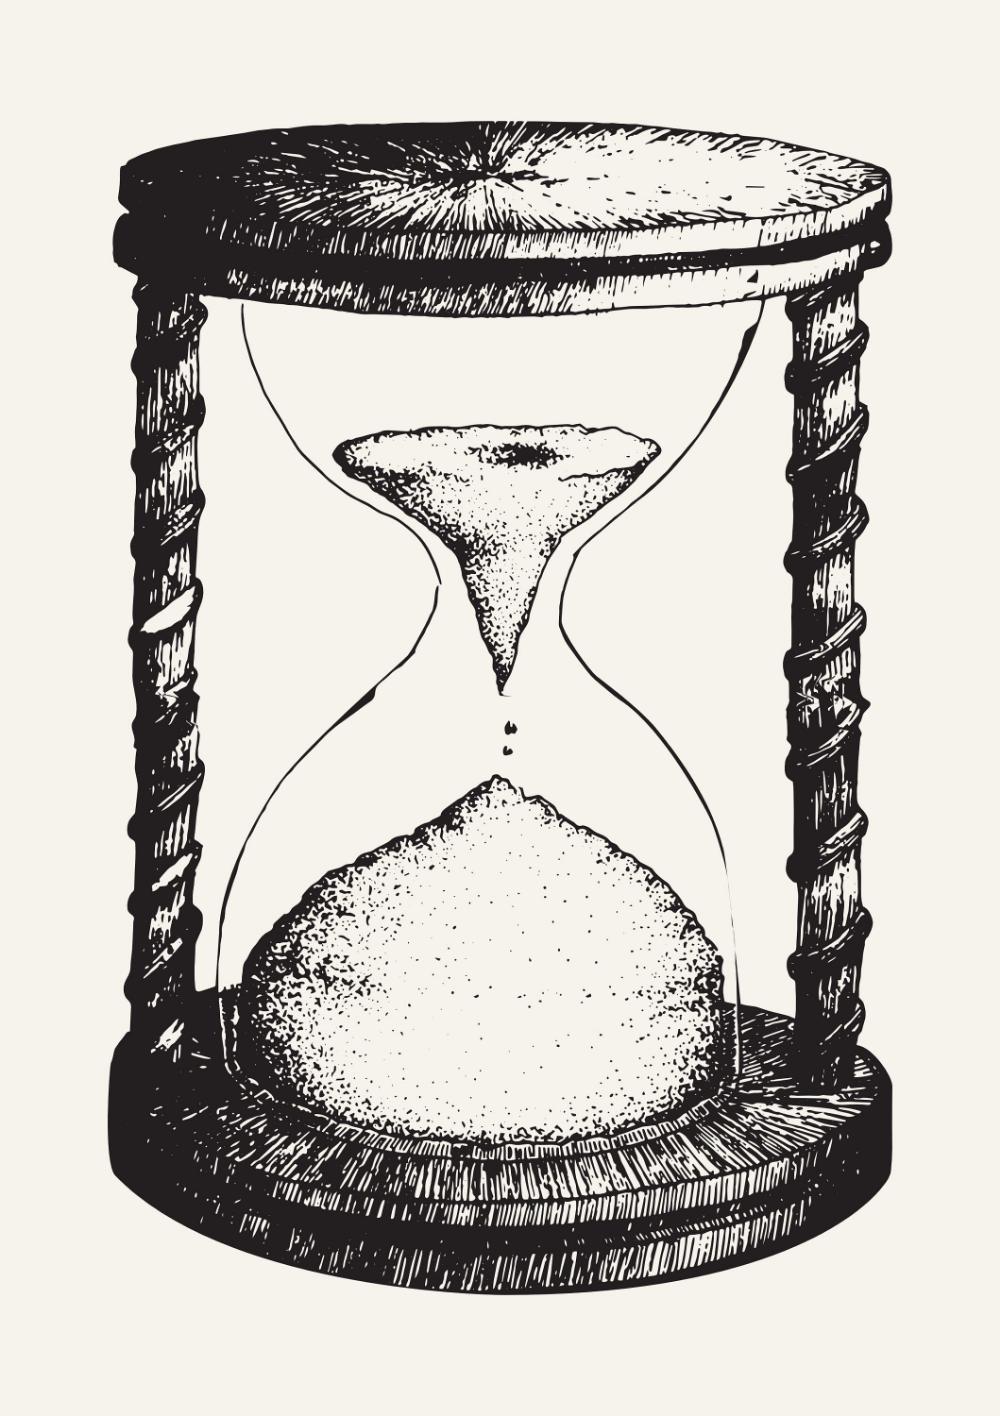 Hourglass Art Print Sand Timer Illustration Vintage Decor Print Minimal Art Black And White Scandinavian Poste Vintage Art Prints Sand Timers Sand Drawing